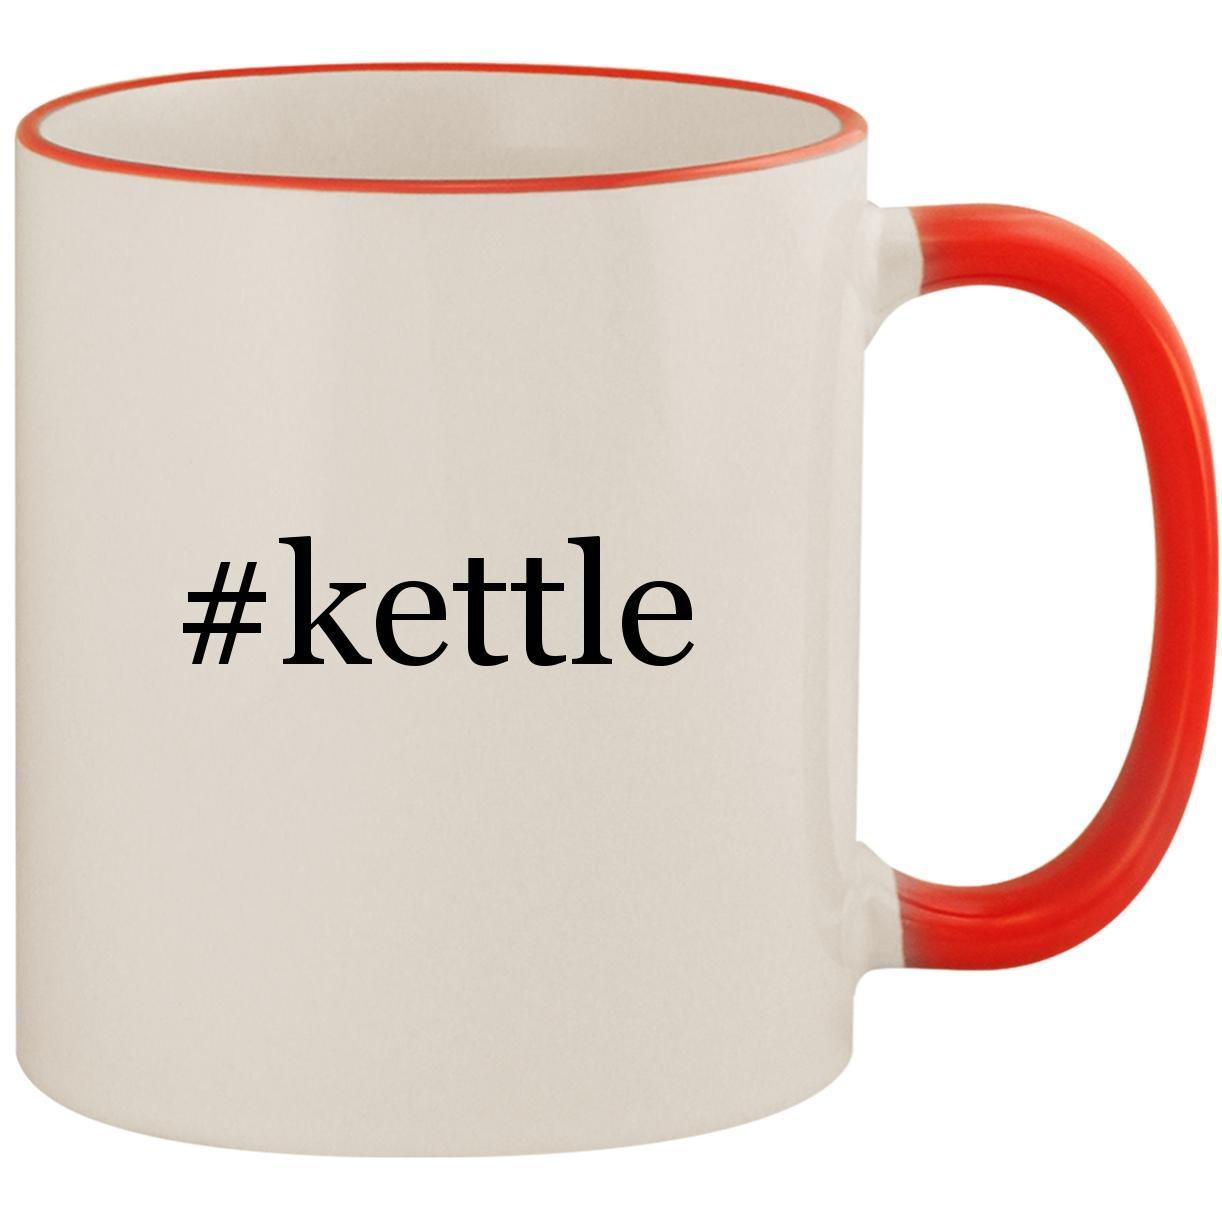 #kettle - 11oz Ceramic Colored Handle & Rim Coffee Mug Cup, Red